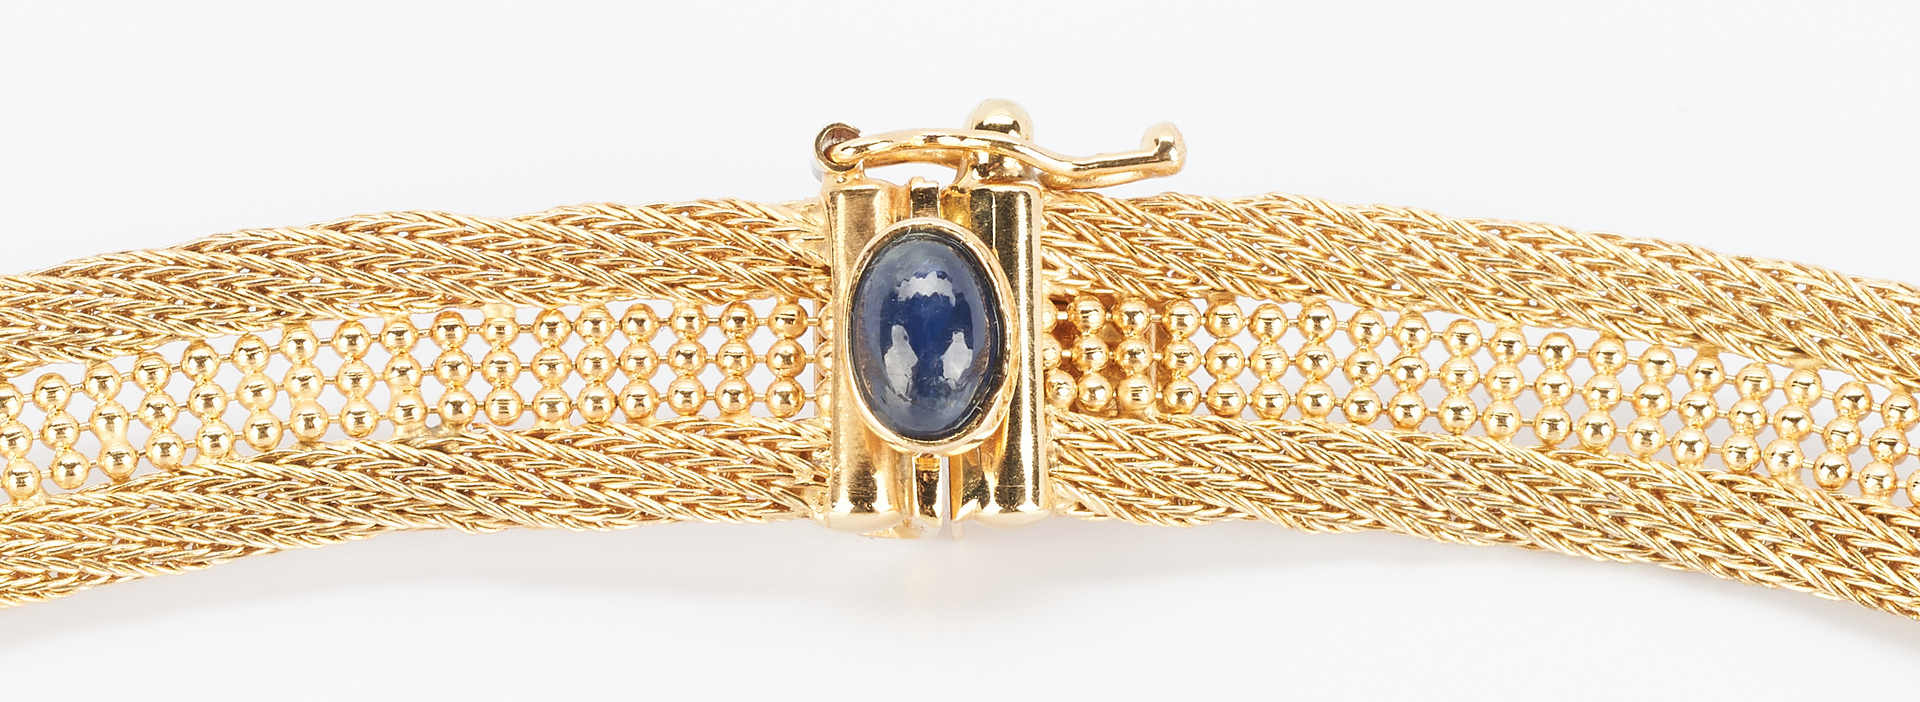 Lot 493: 14k Gold Mesh Necklace w/ Sapphire Clasp